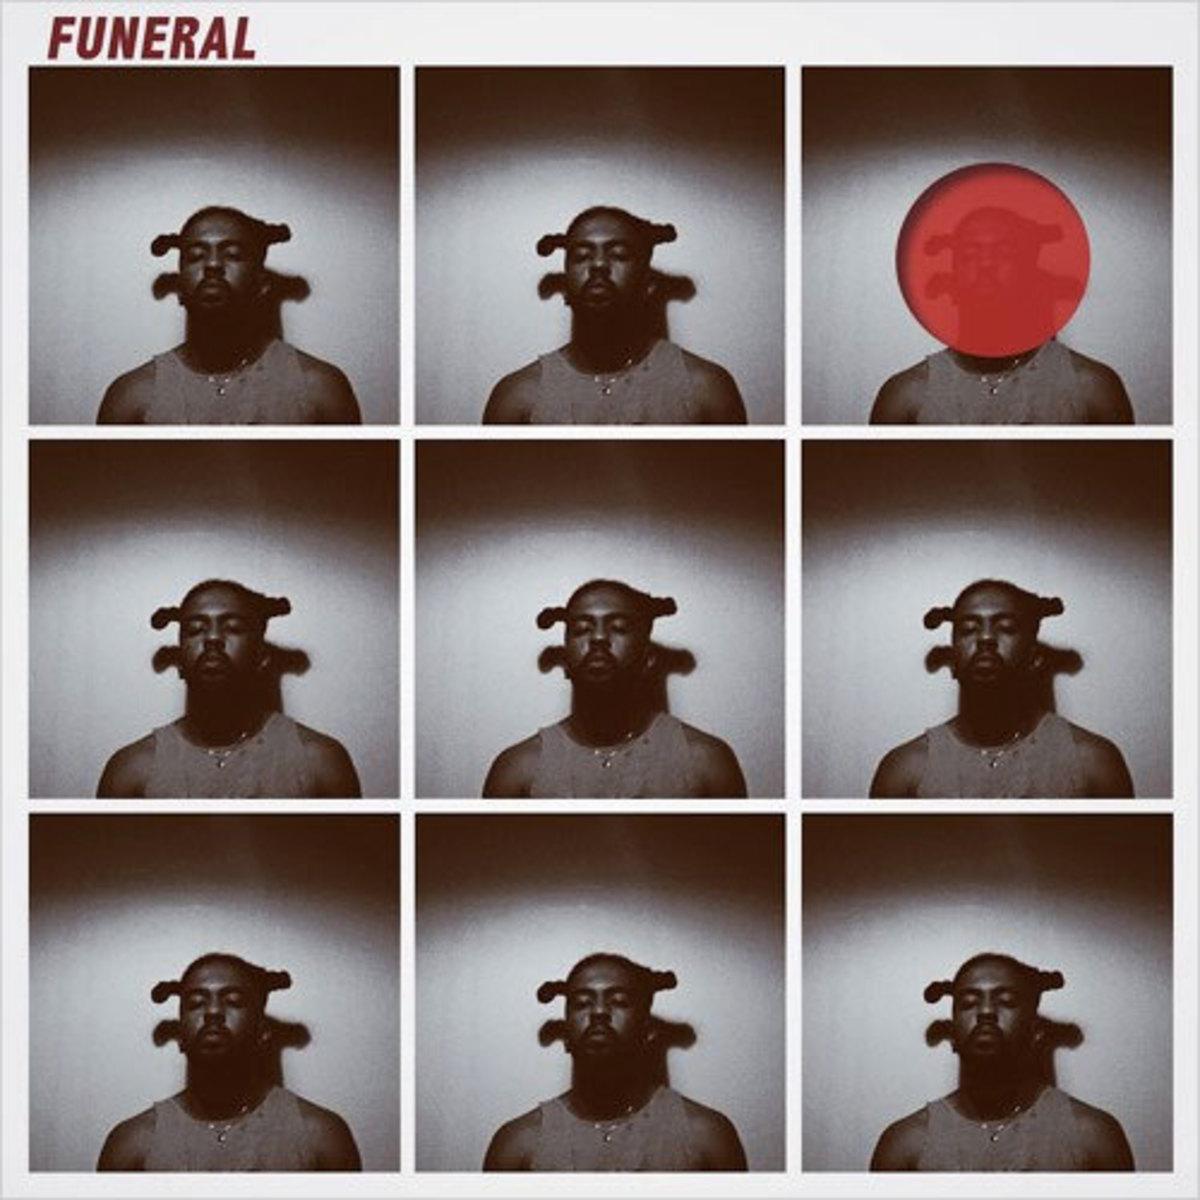 vector-xing-funeral.jpg